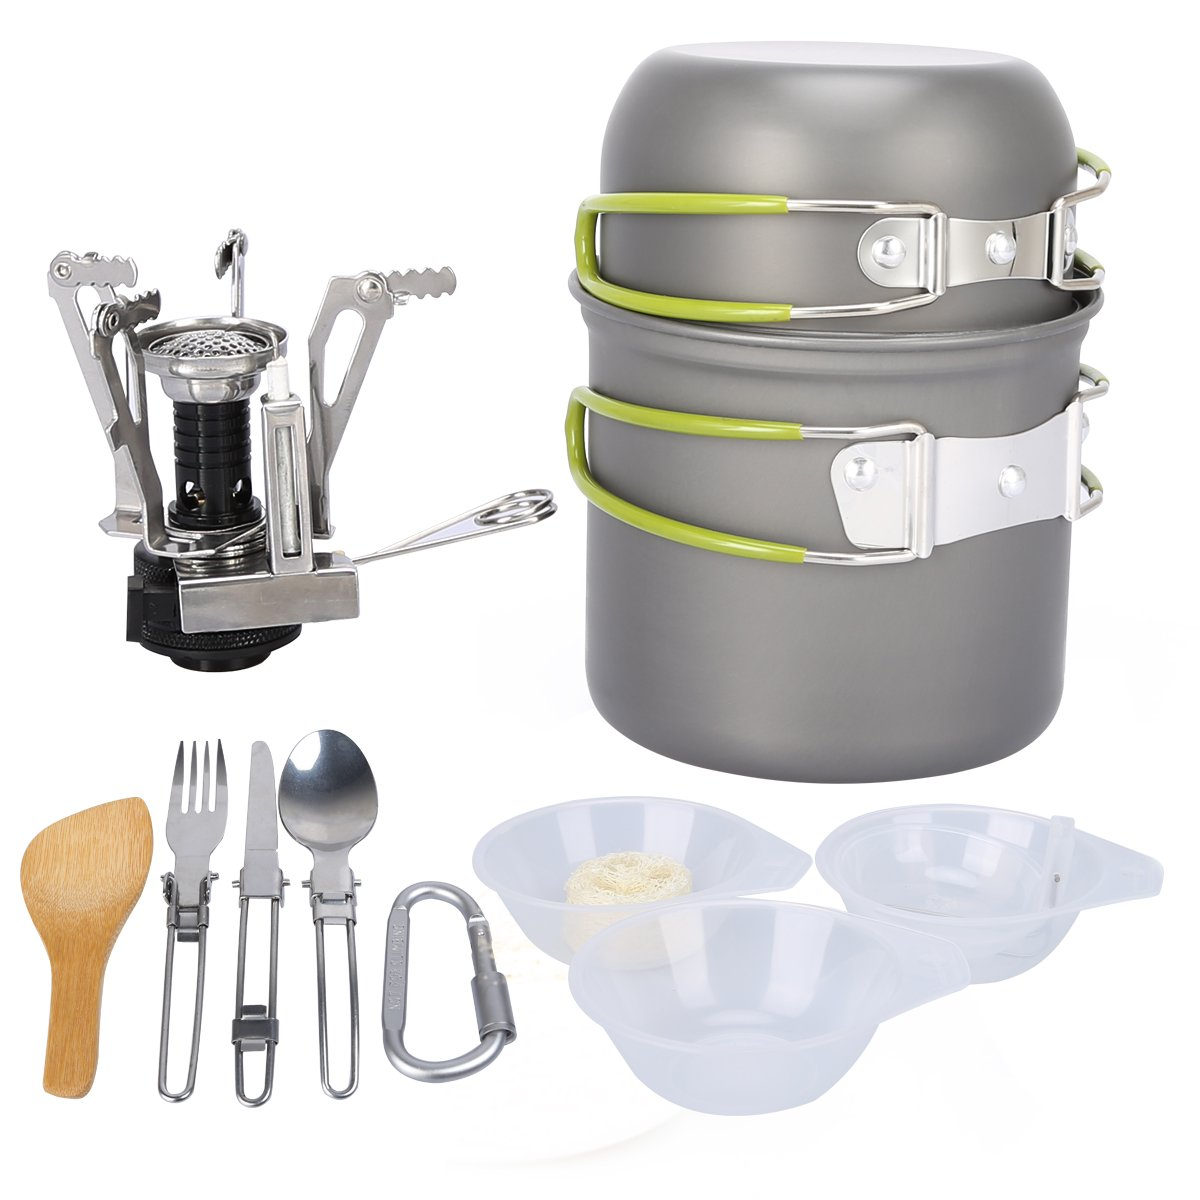 G4Free Outdoor Camping pan Hiking Cookware Backpacking Cooking Picnic Bowl Pot Pan Set 4 Piece Camping Cookware Mess Kit(13 PCS-Green) by G4Free